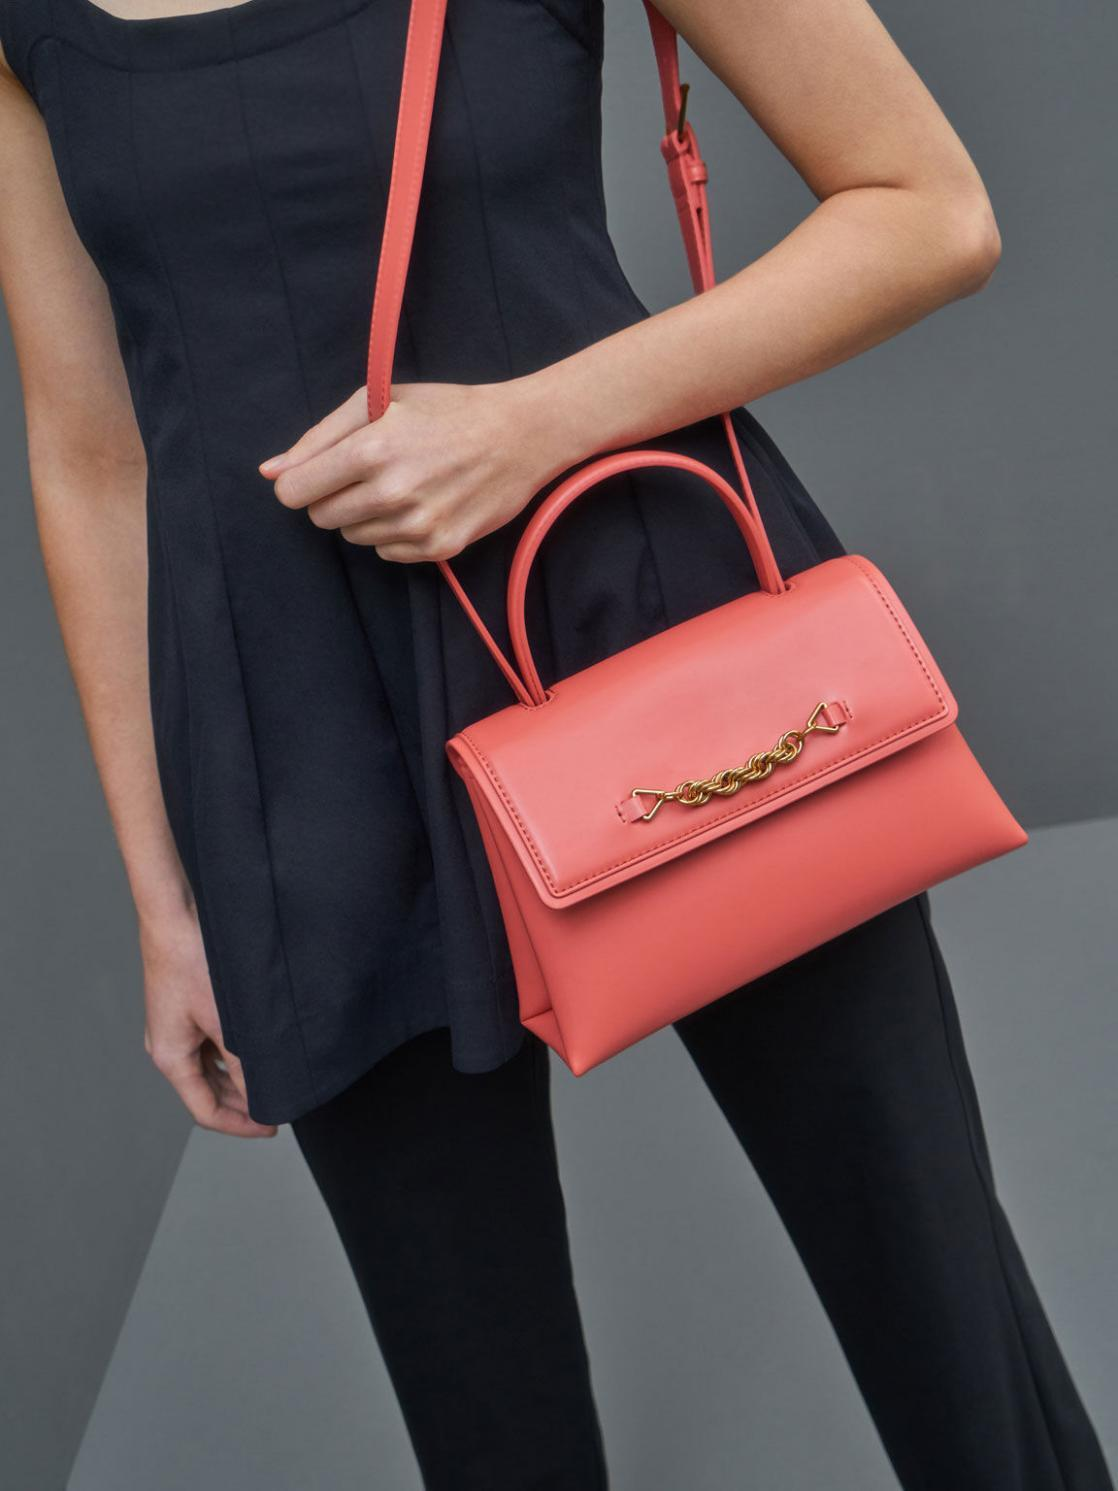 A girl wearing red colour Charles & Keith' handbag